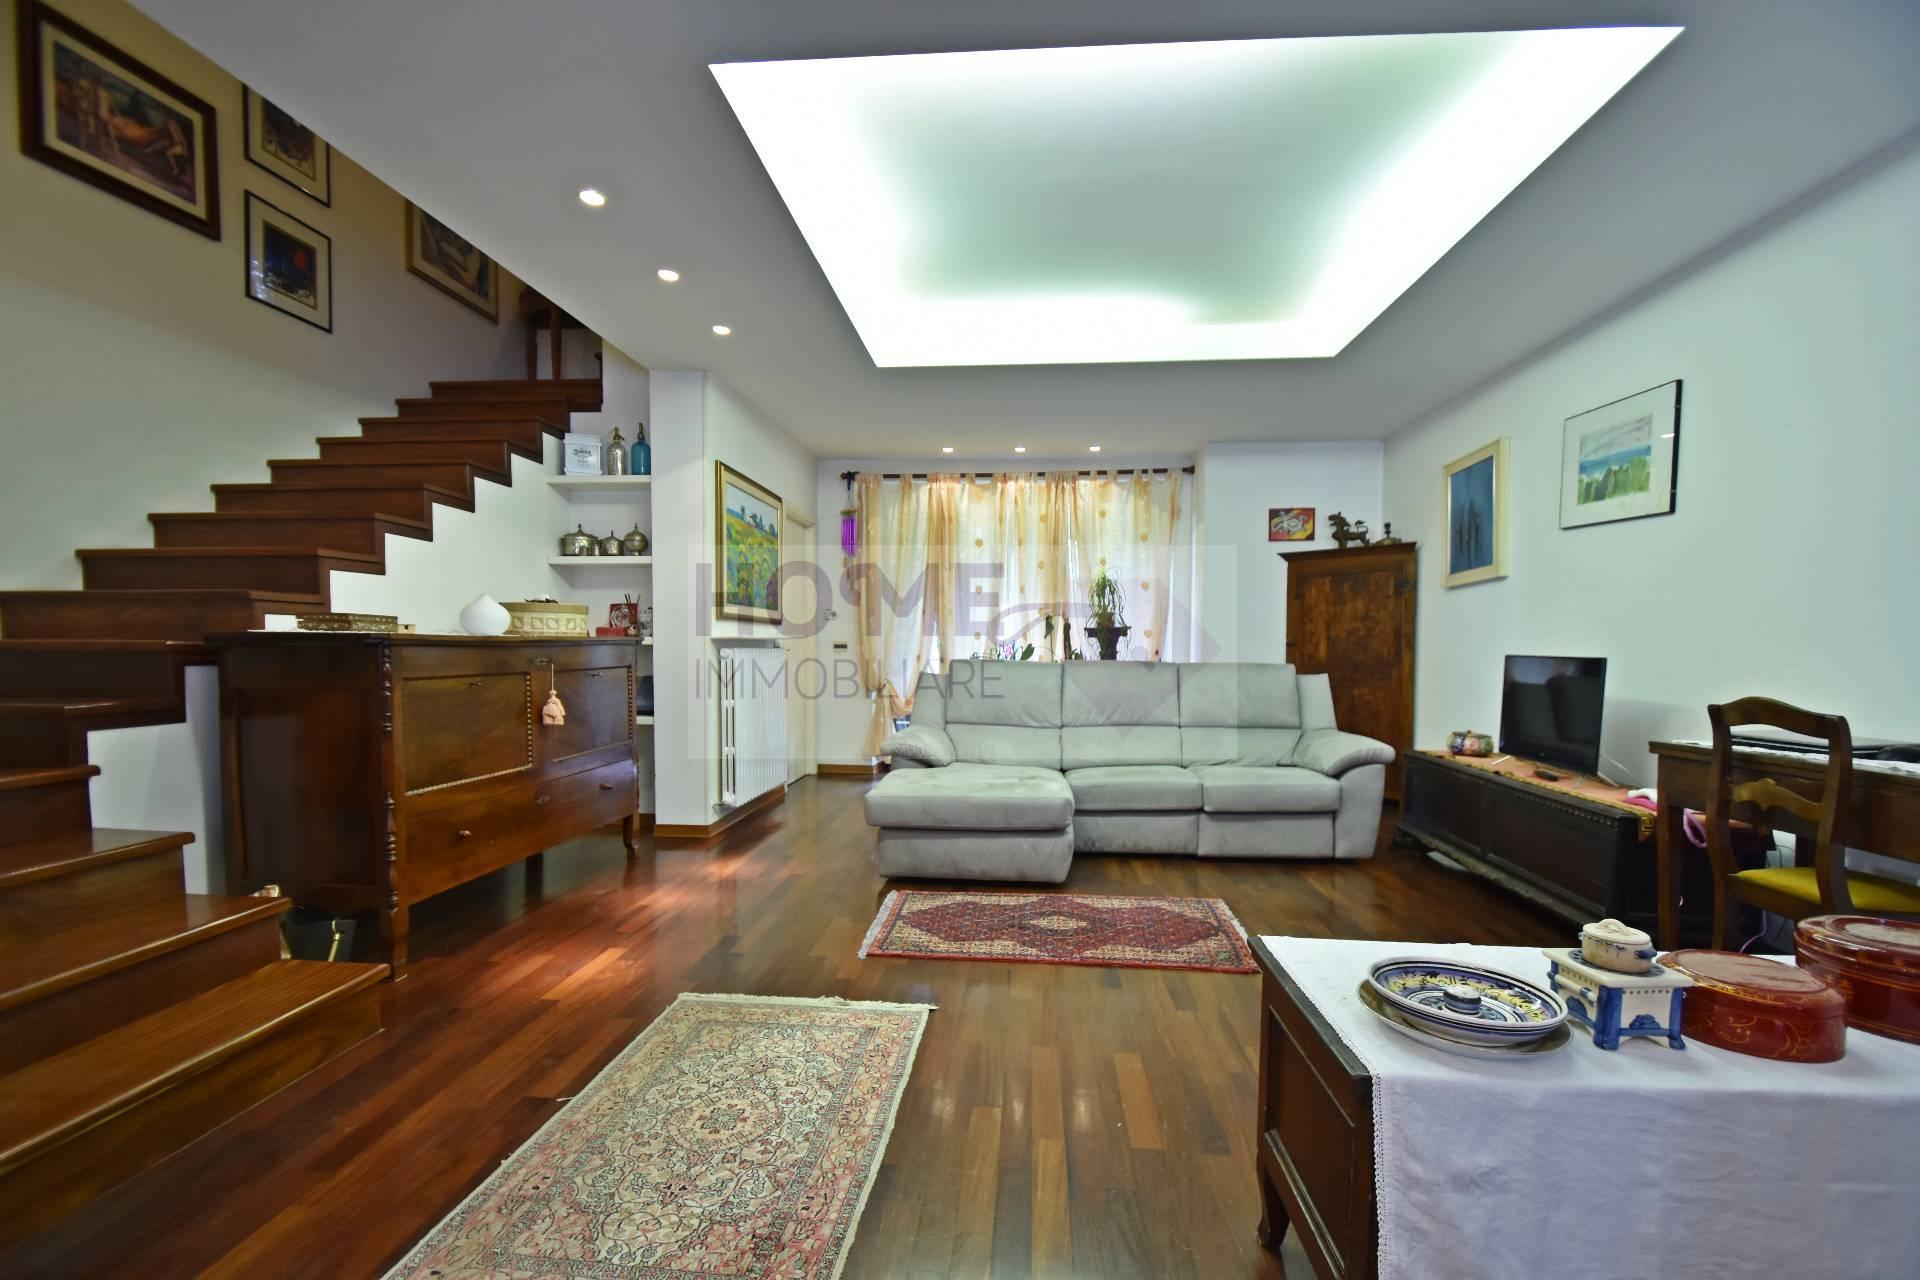 macerata vendita quart: zona colleverde home immobiliare snc